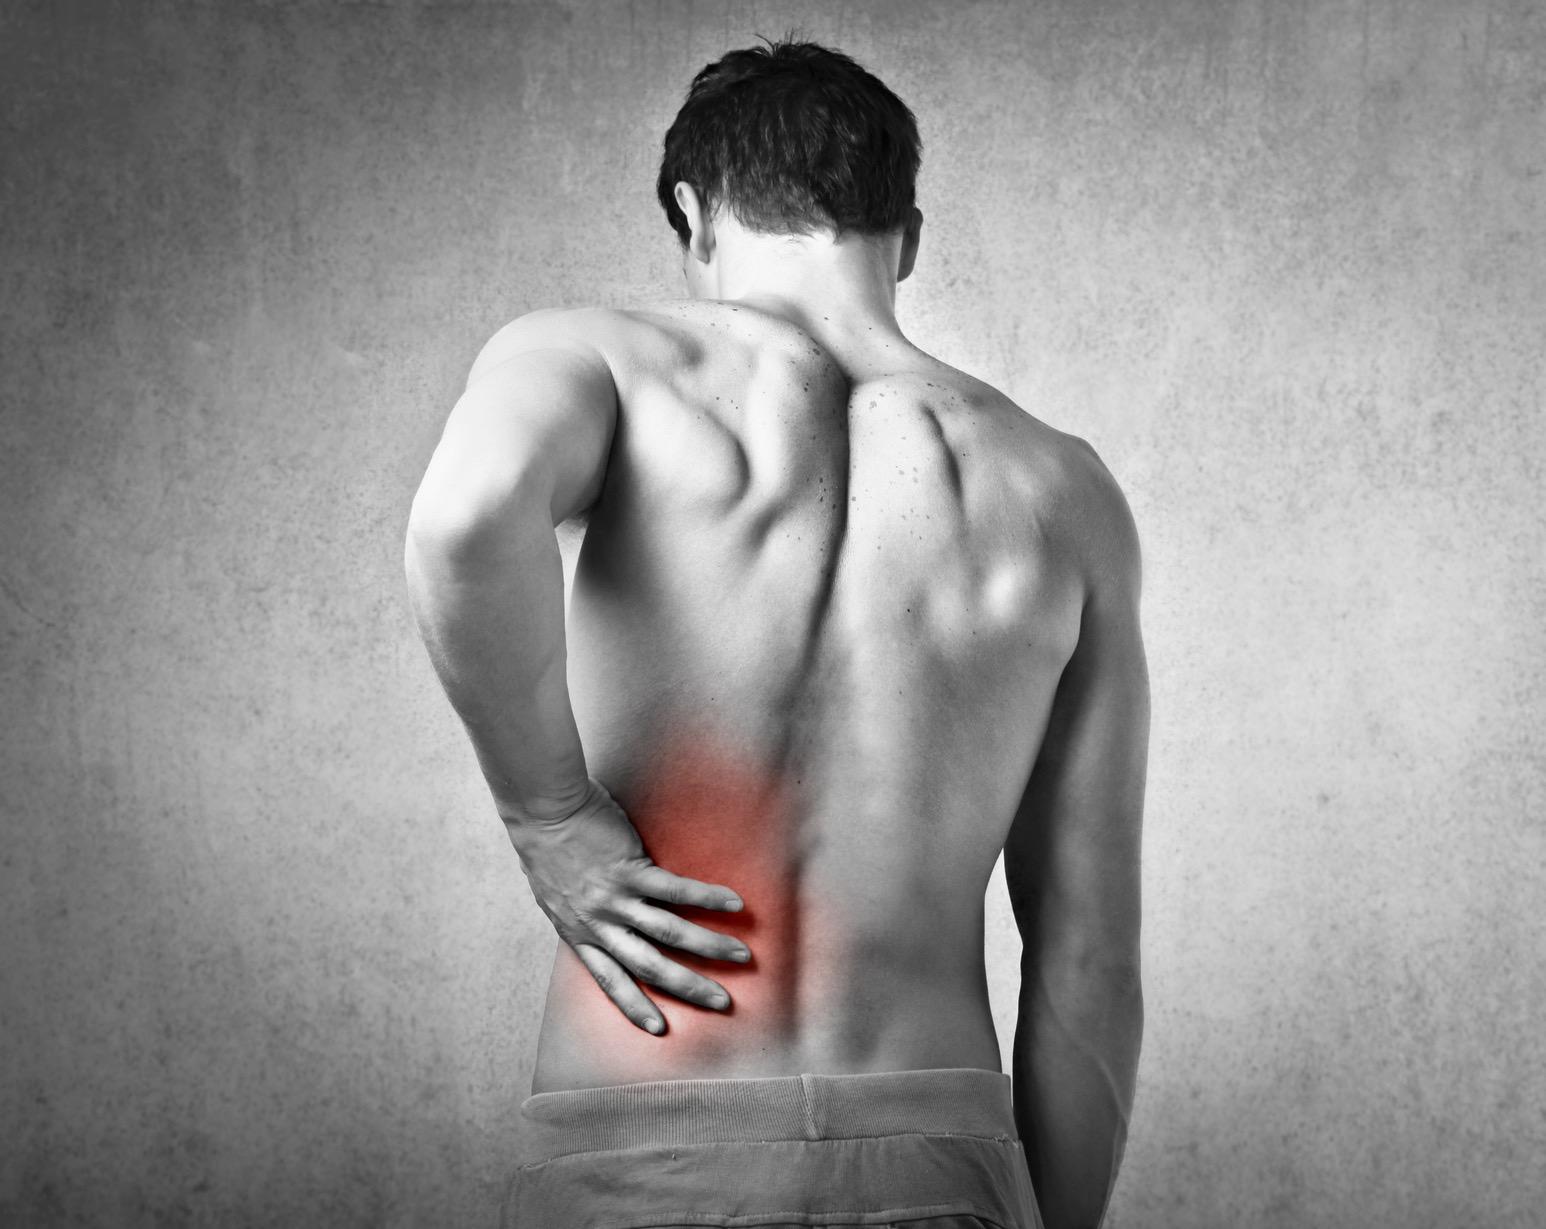 airalia dolor espalda